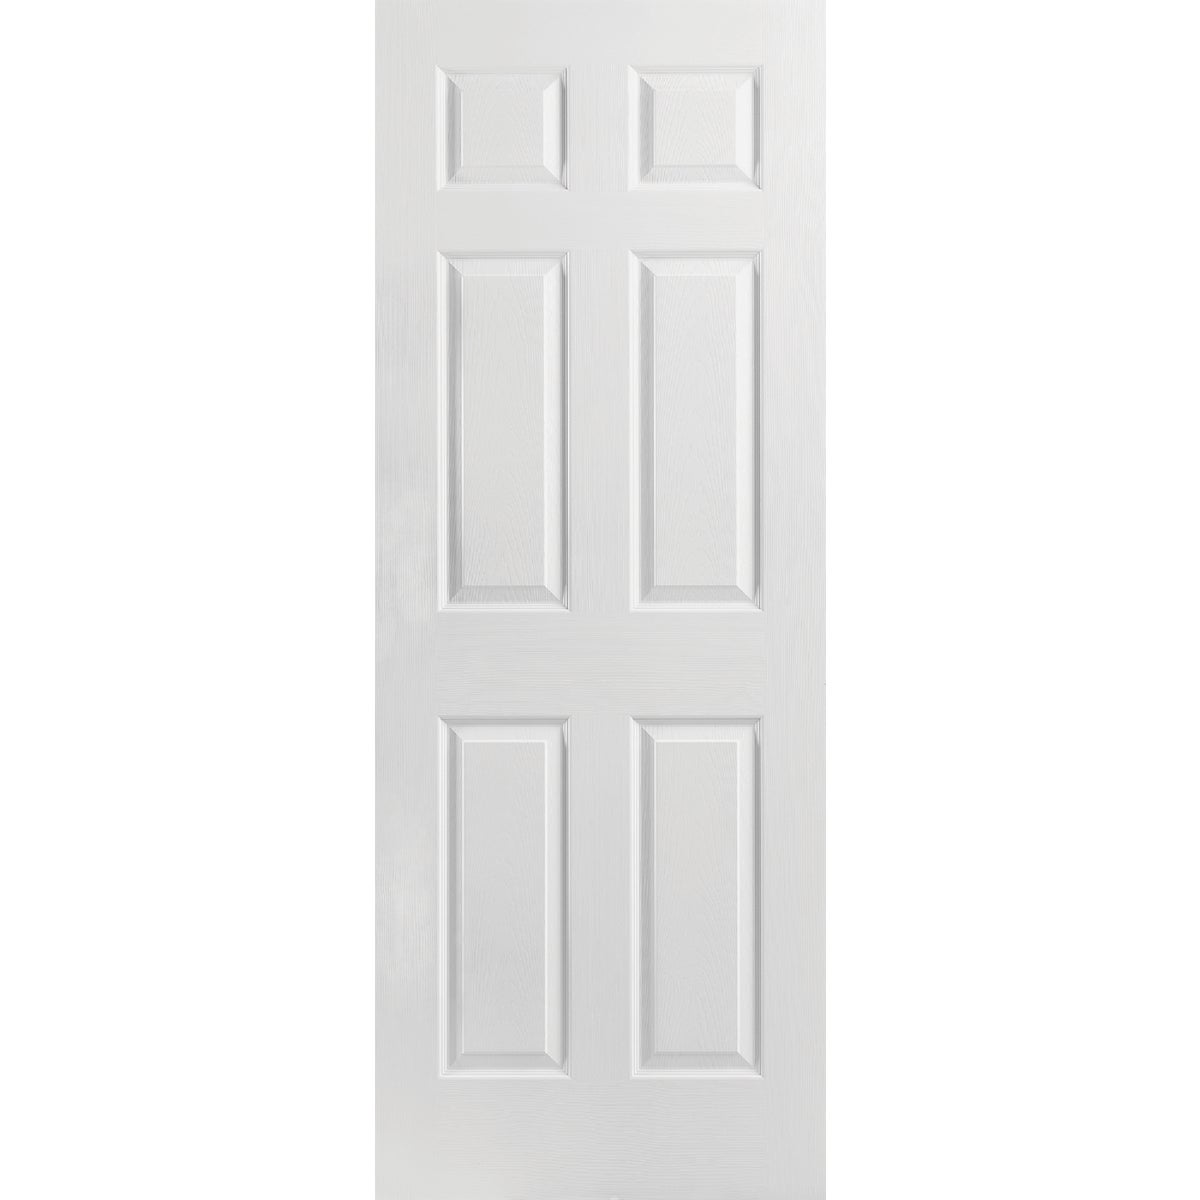 Masonite 2/6 1-3/8 6PN TX HC DOOR